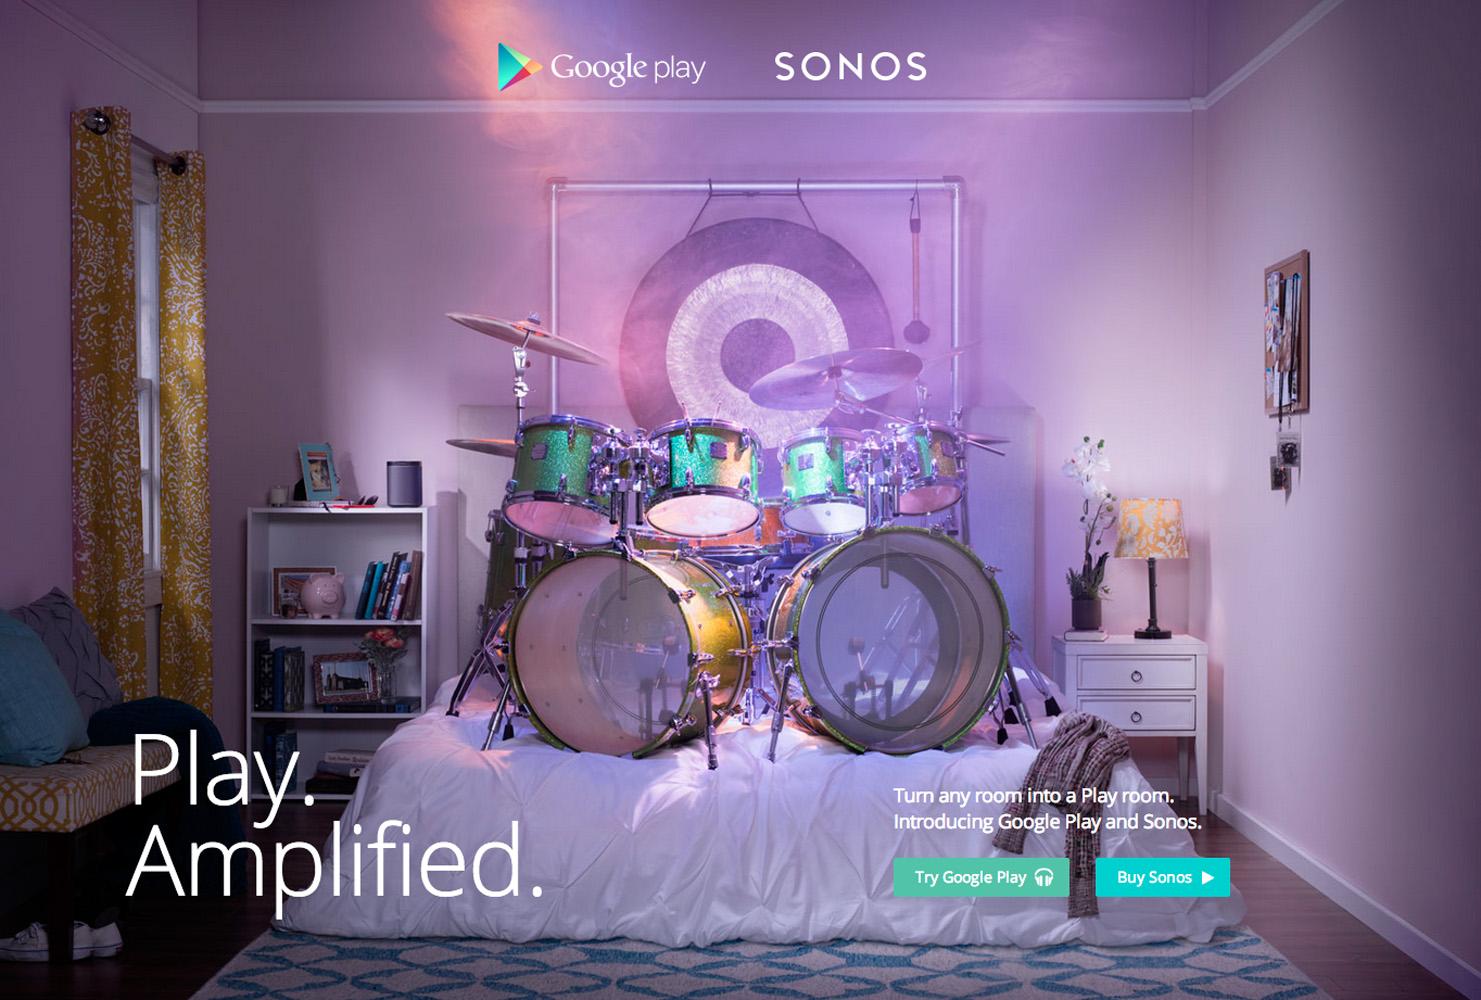 Google Sonos, Advertising